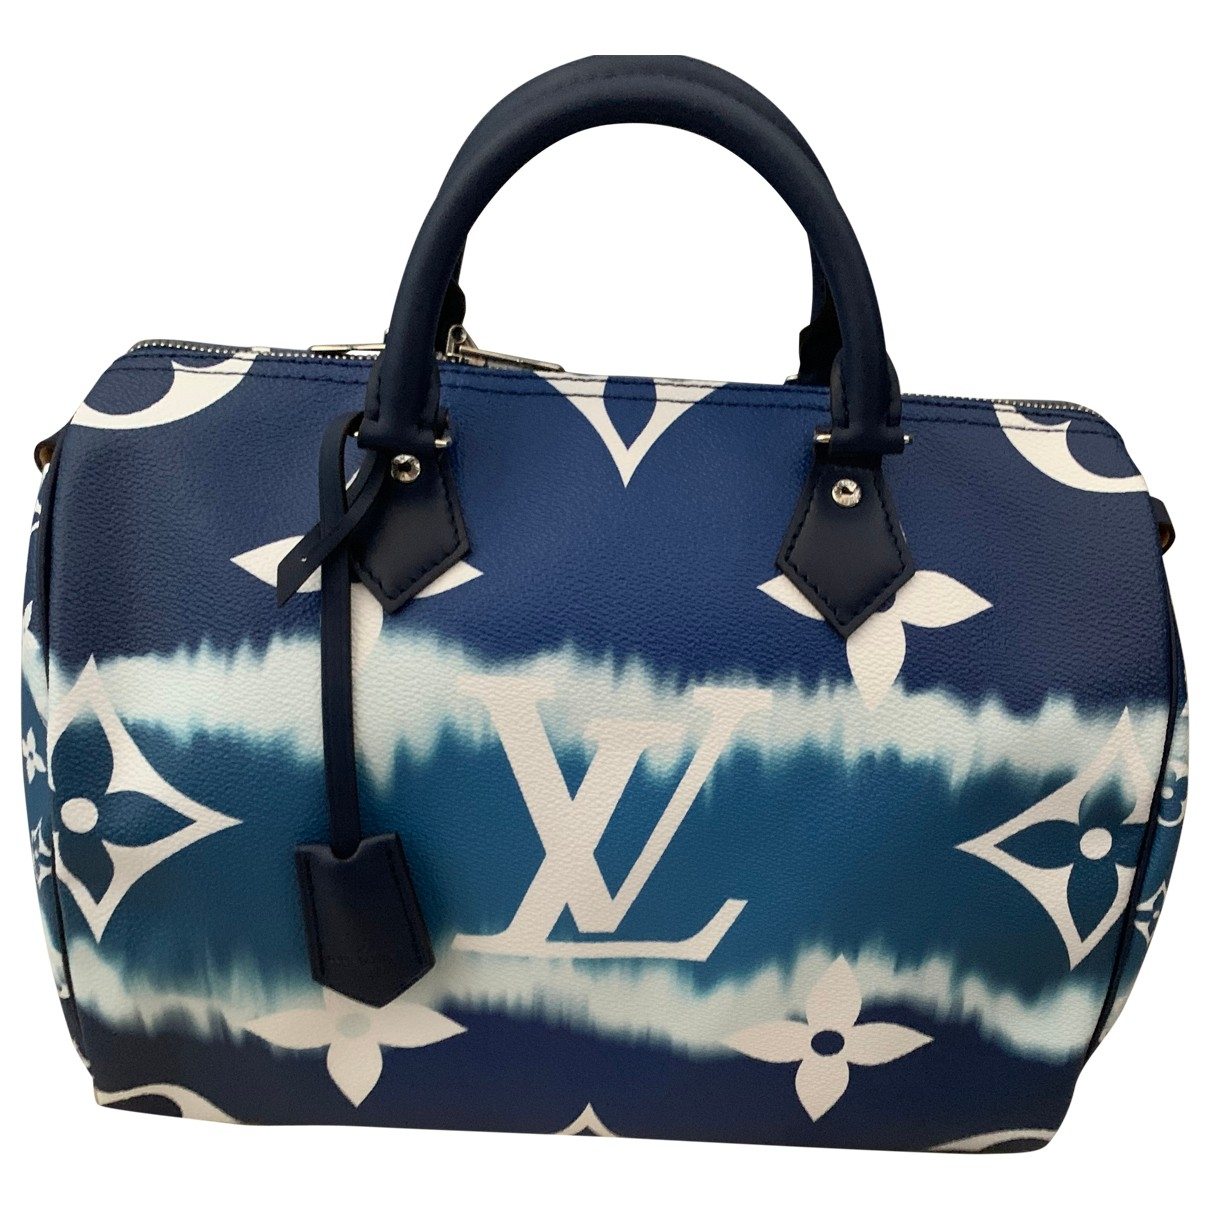 Louis Vuitton - Sac a main Speedy Bandouliere pour femme en toile - bleu